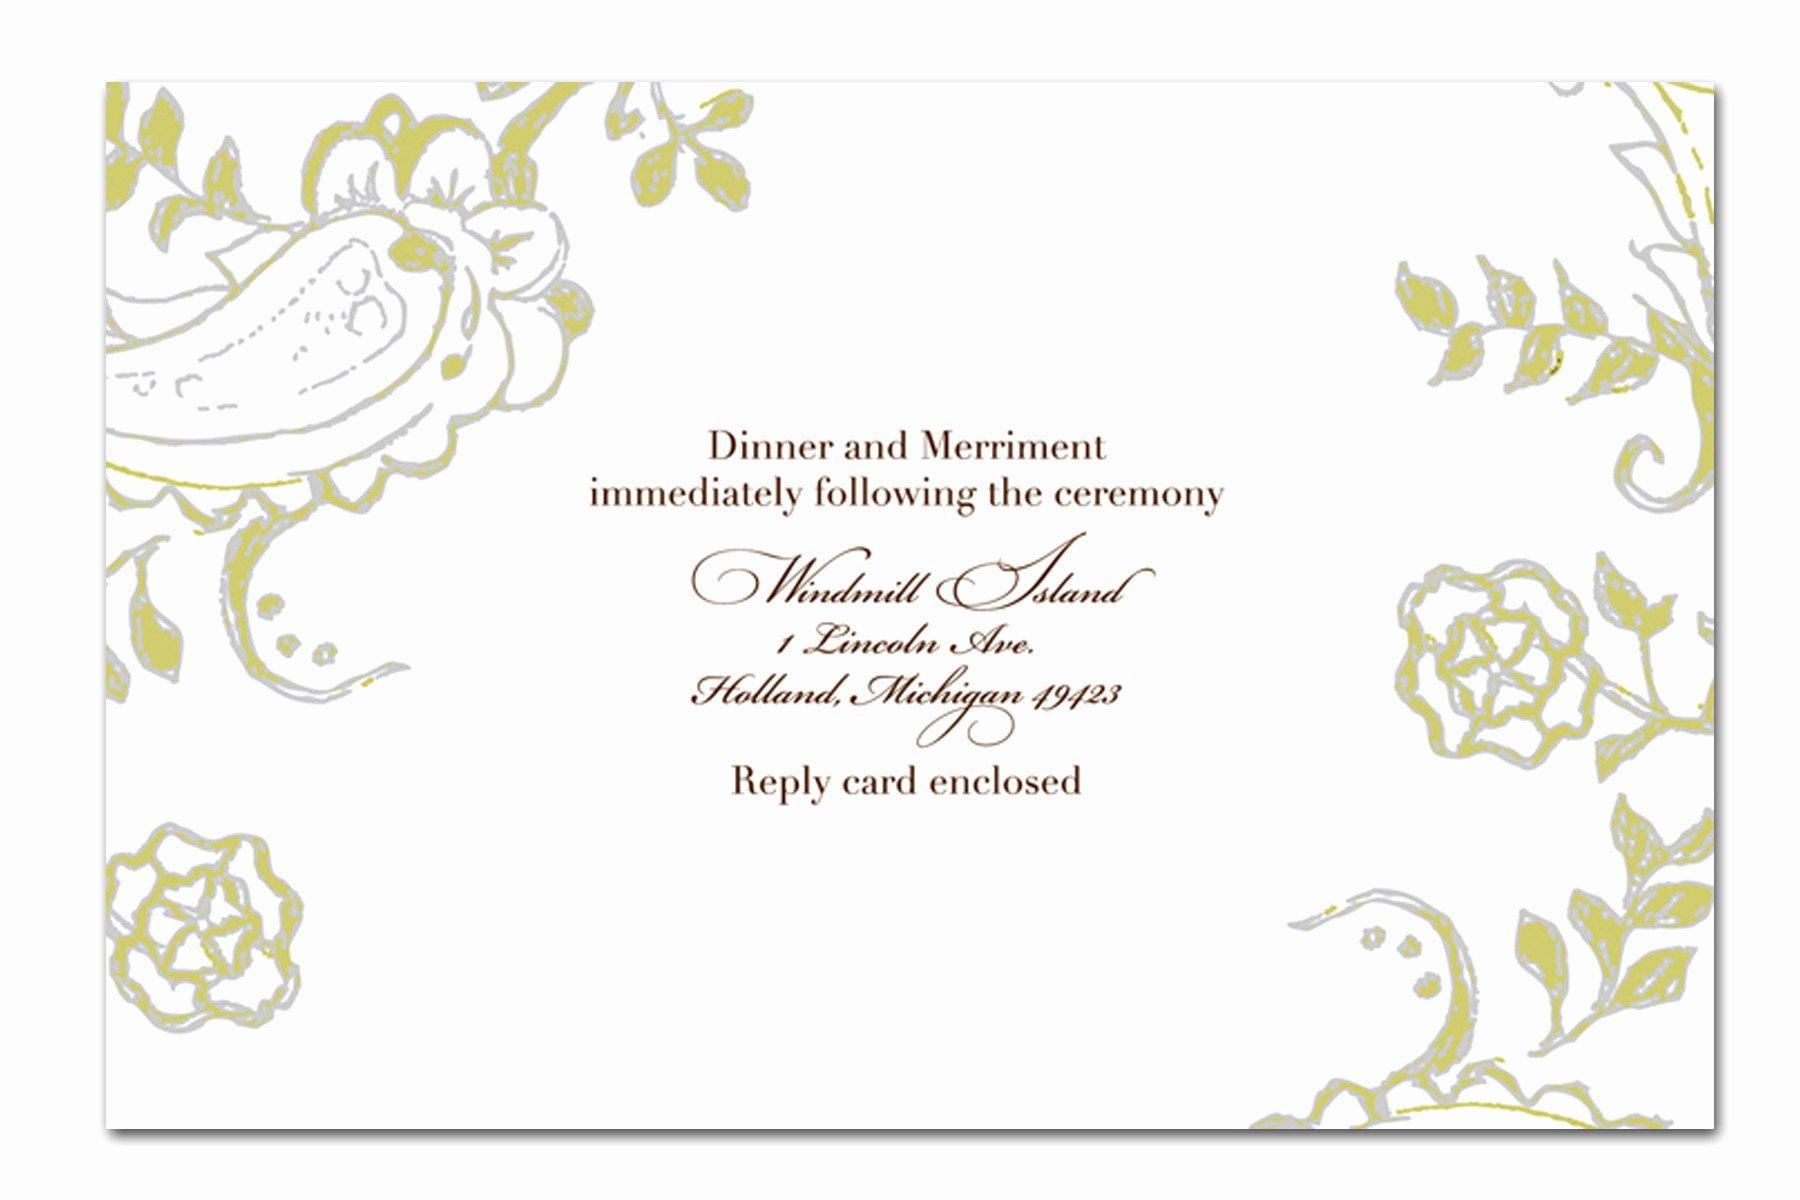 Wedding Invite Photoshop Template Unique Wedding Invitation Templates Psd Shop Free Creative